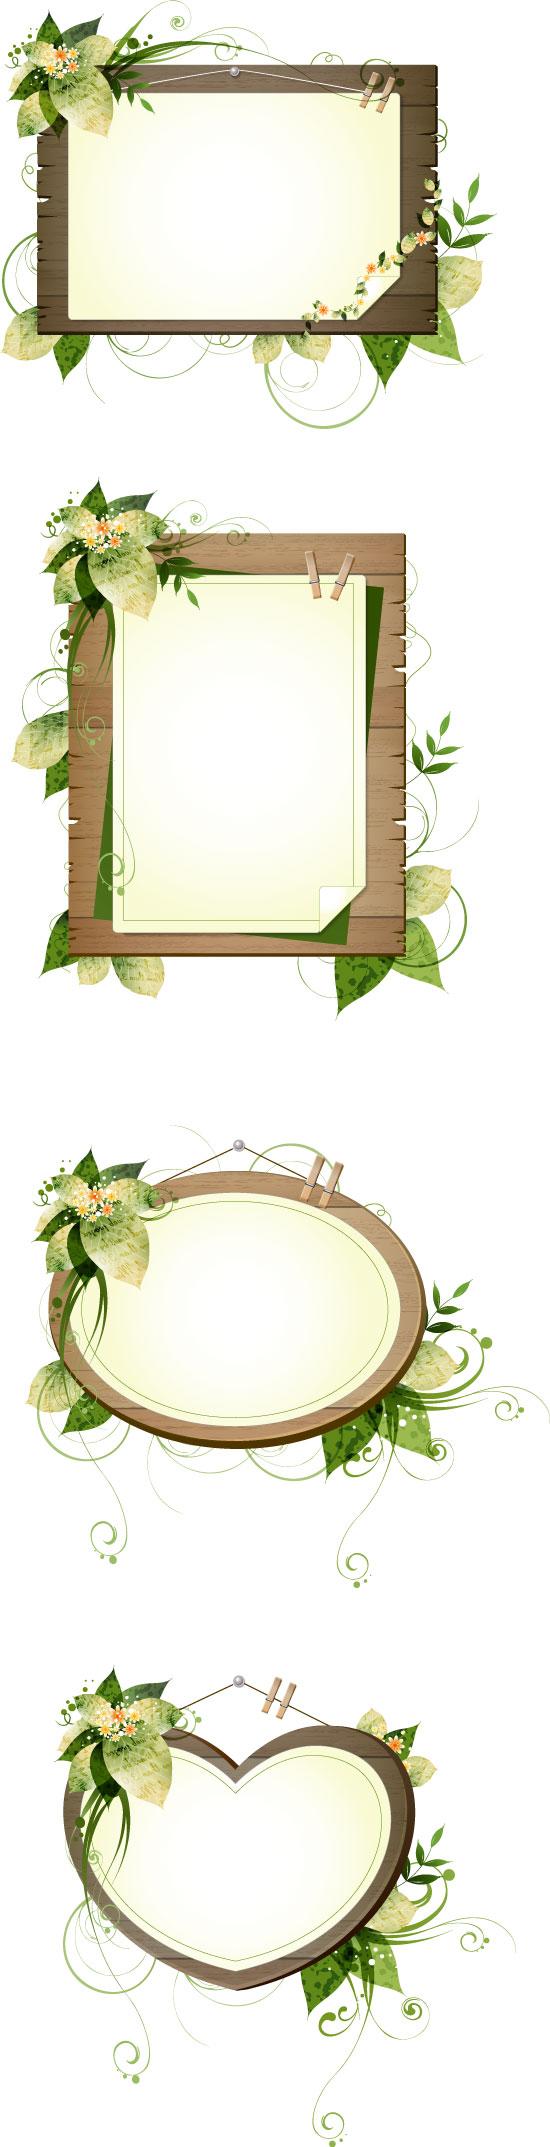 Plant Decorative Wood Frame Vector Vector Frames